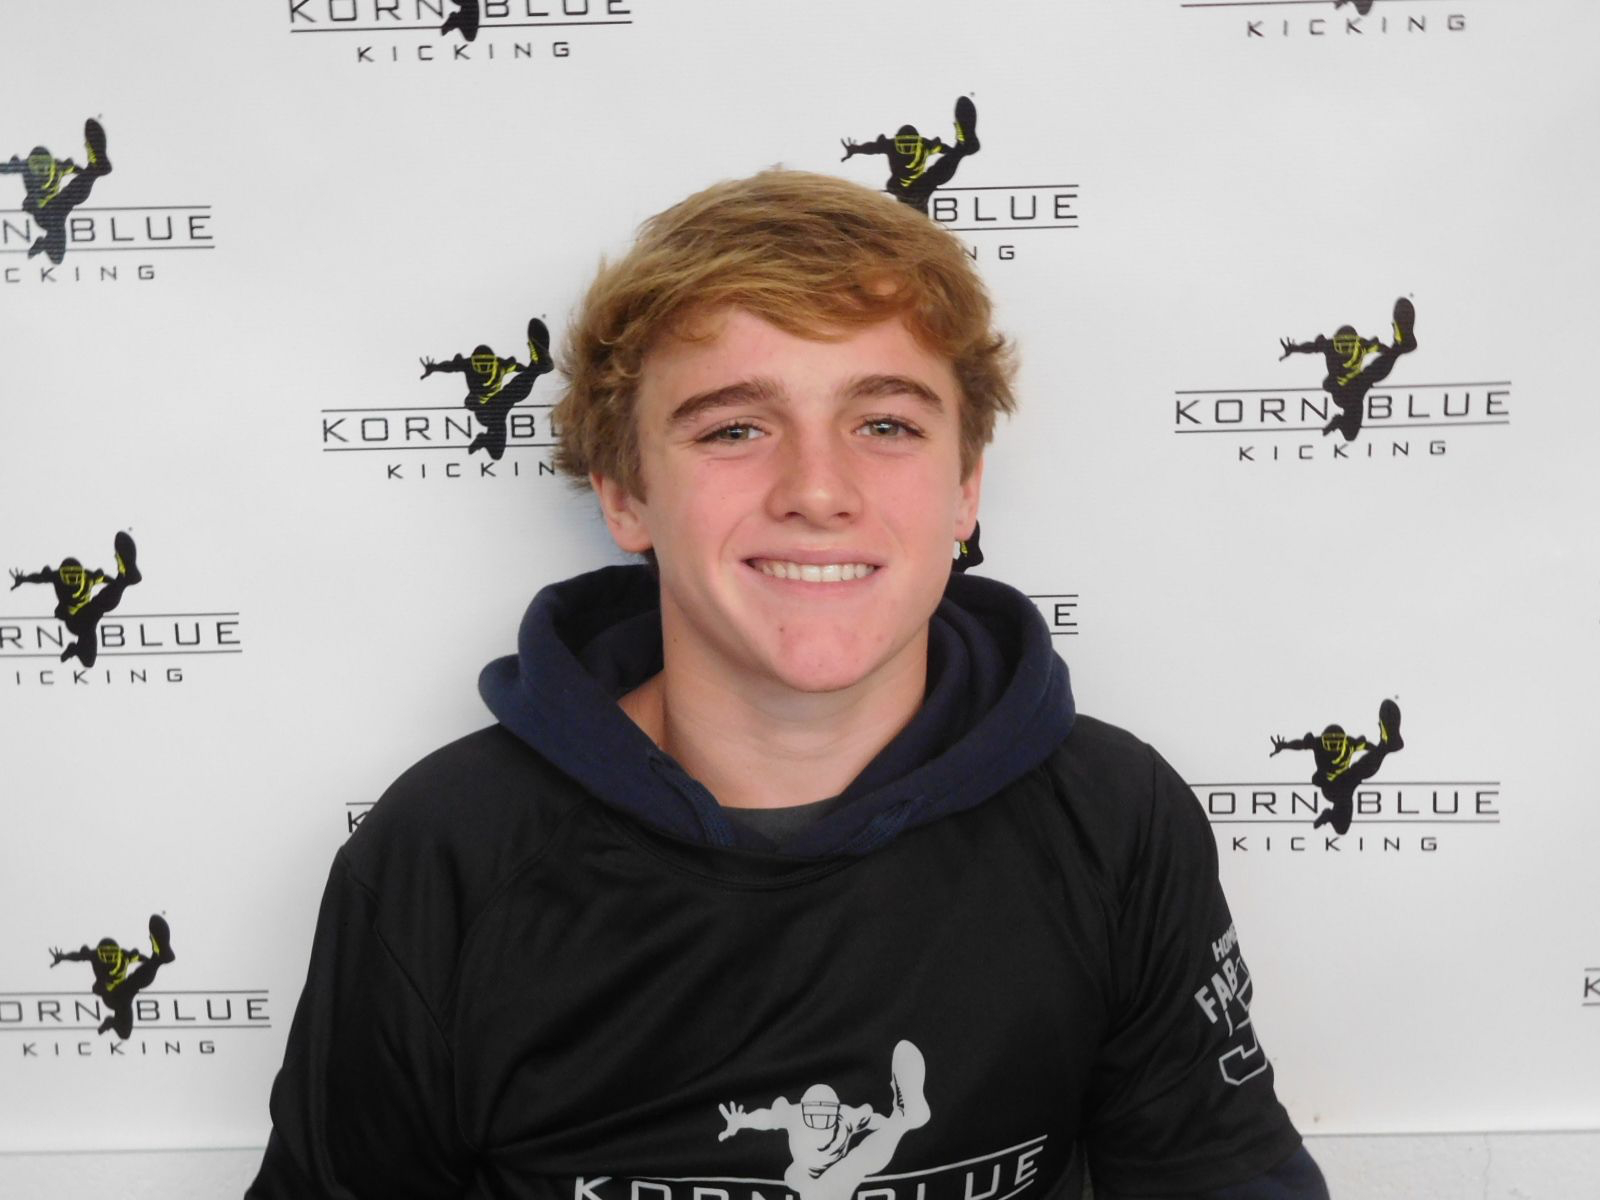 Ryan Duenkel | Kornblue Kicking throughout Hawaii School Calendar 2022 2023